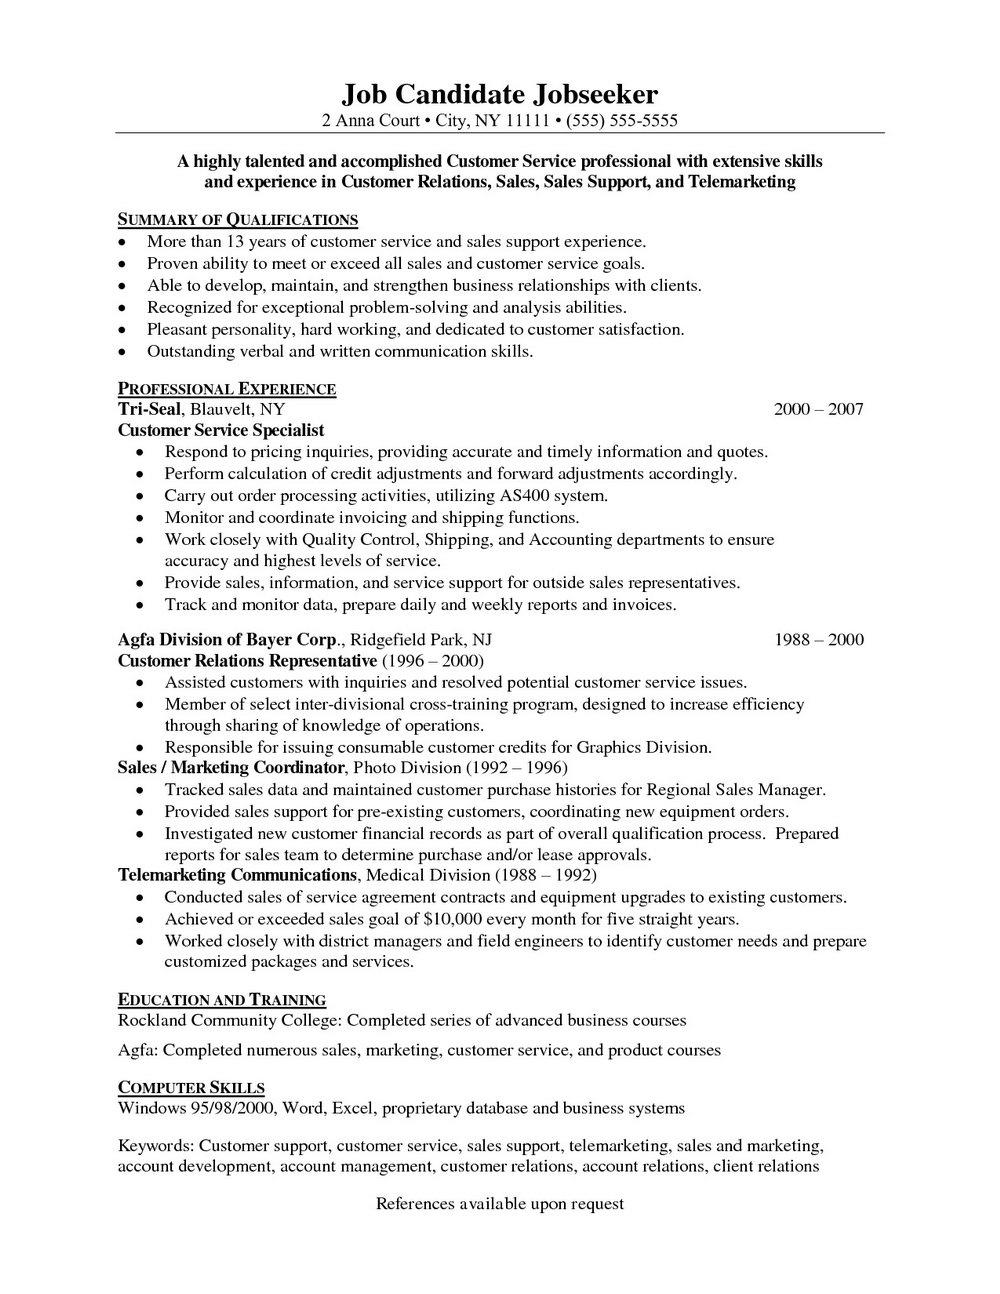 Free Customer Service Resume Templates